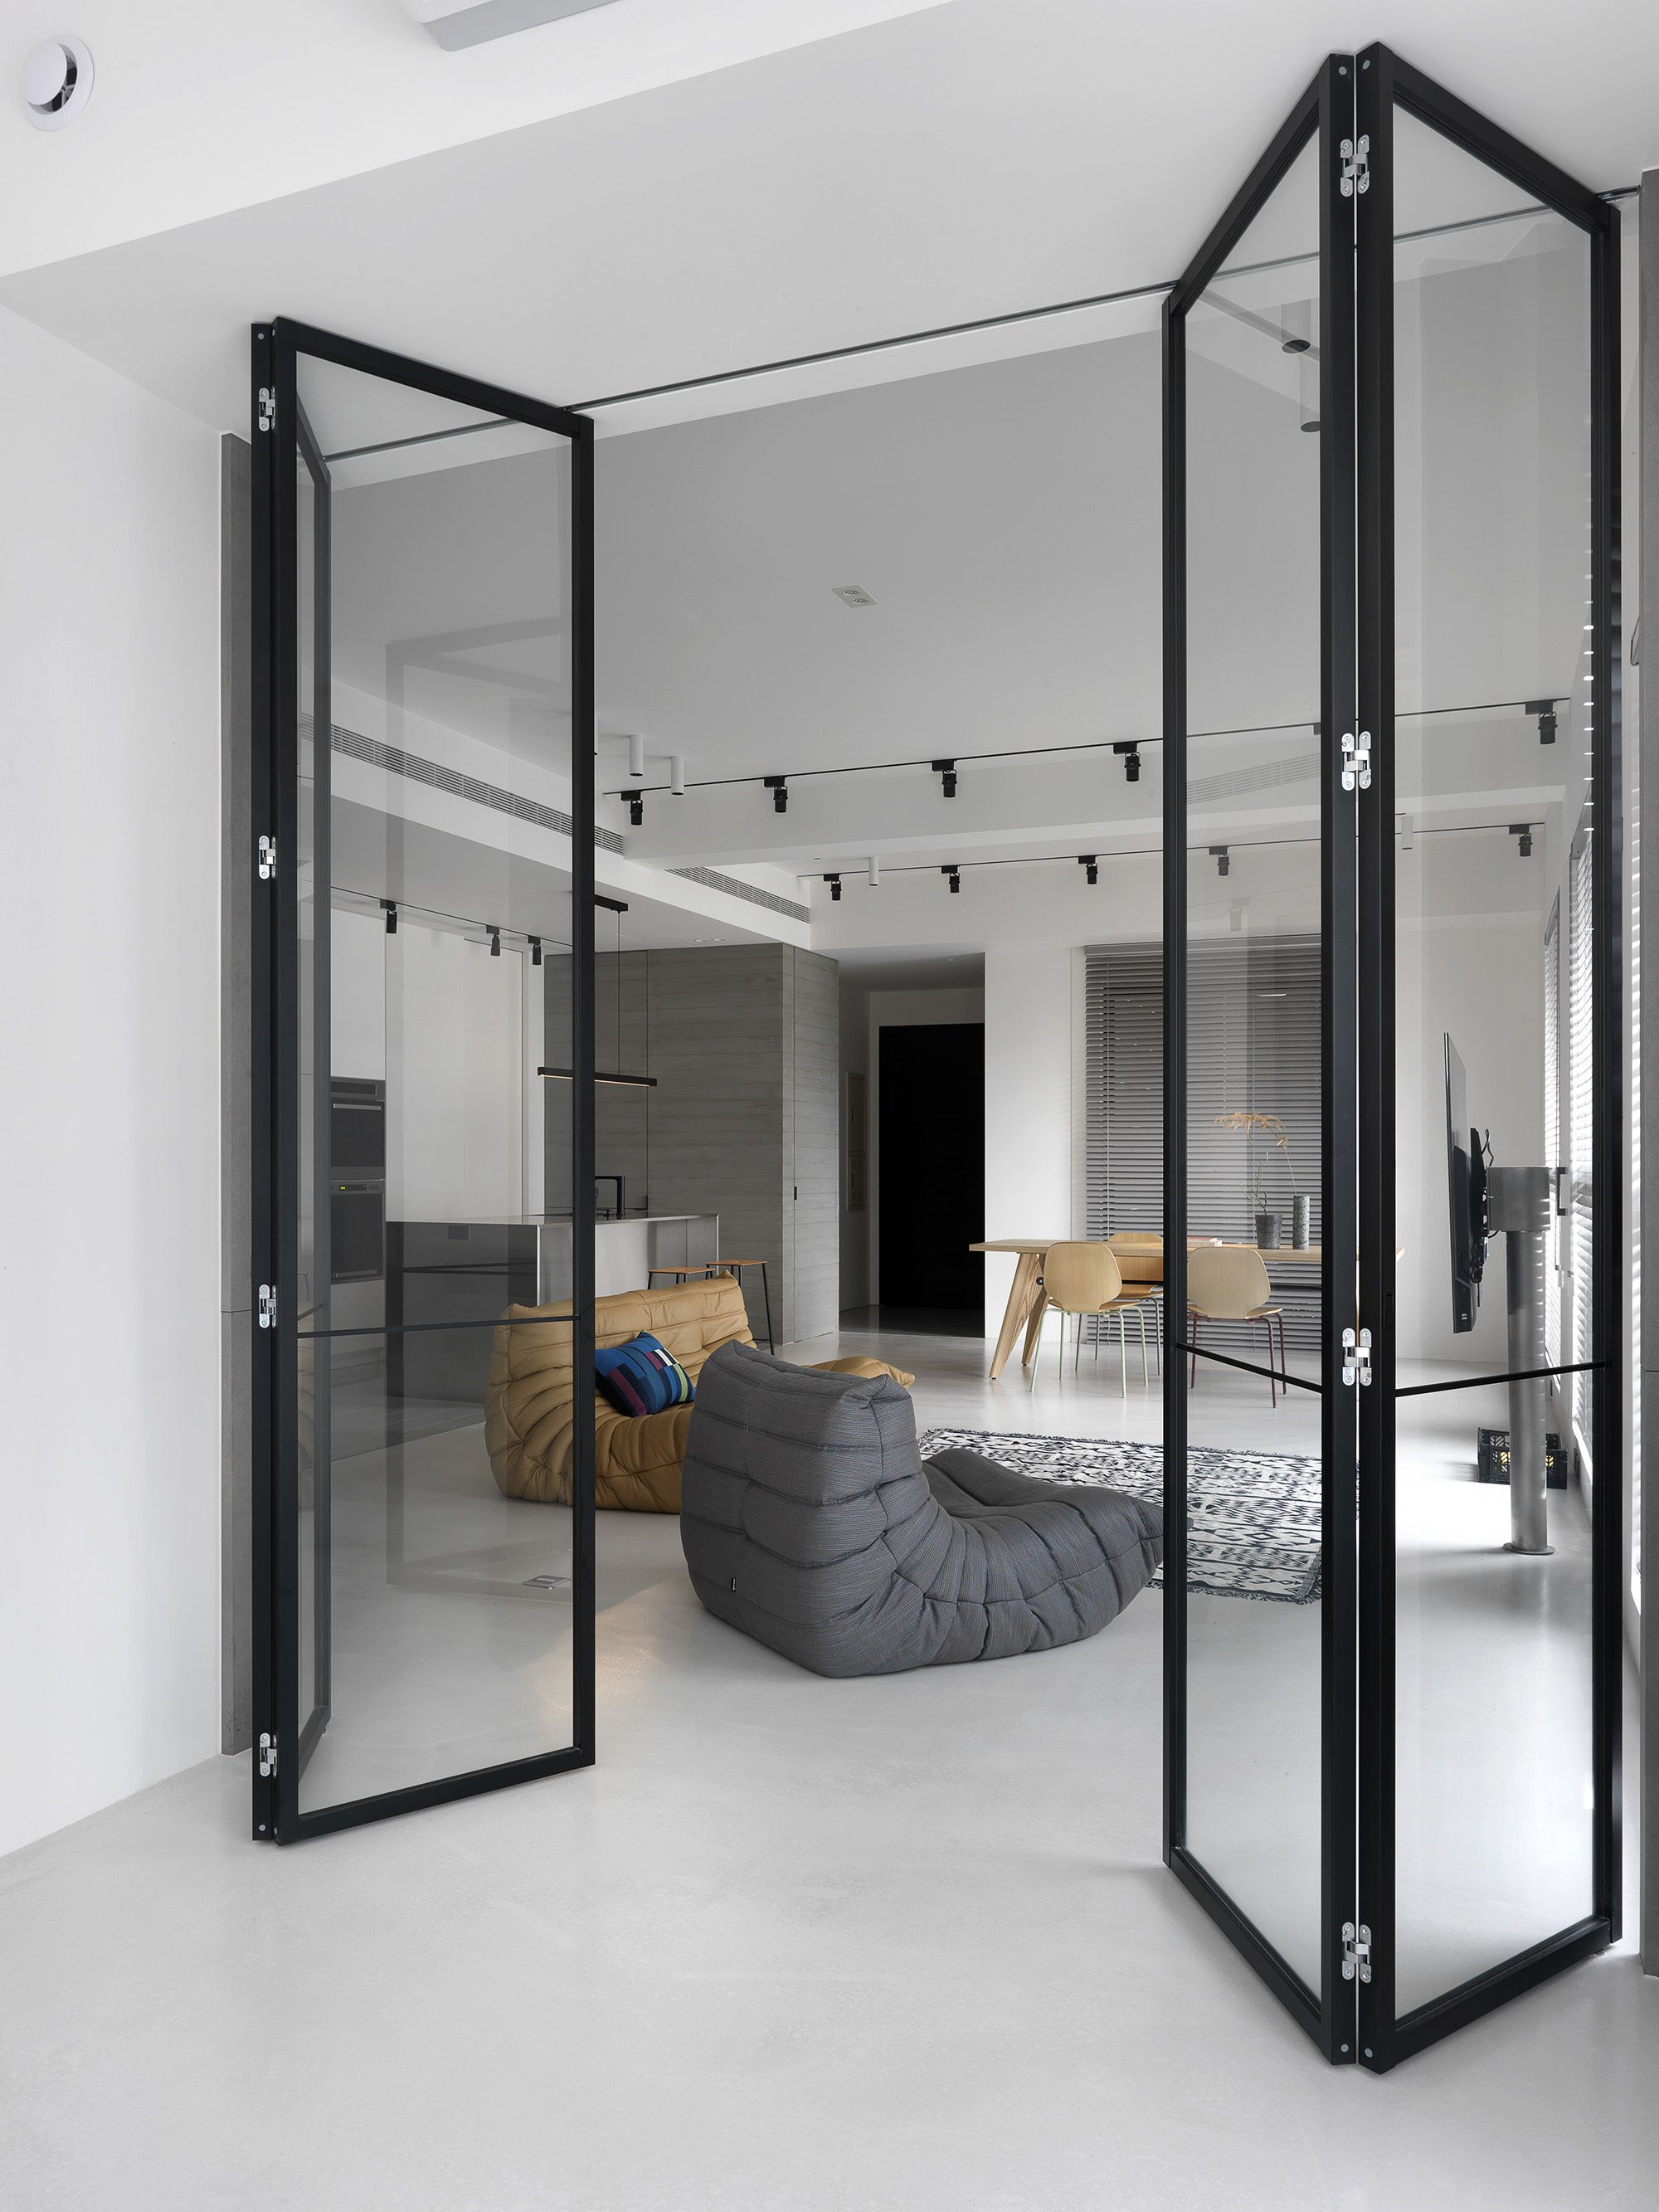 Galería de Casa Chiang / 2BOOKS design 6 Puertas